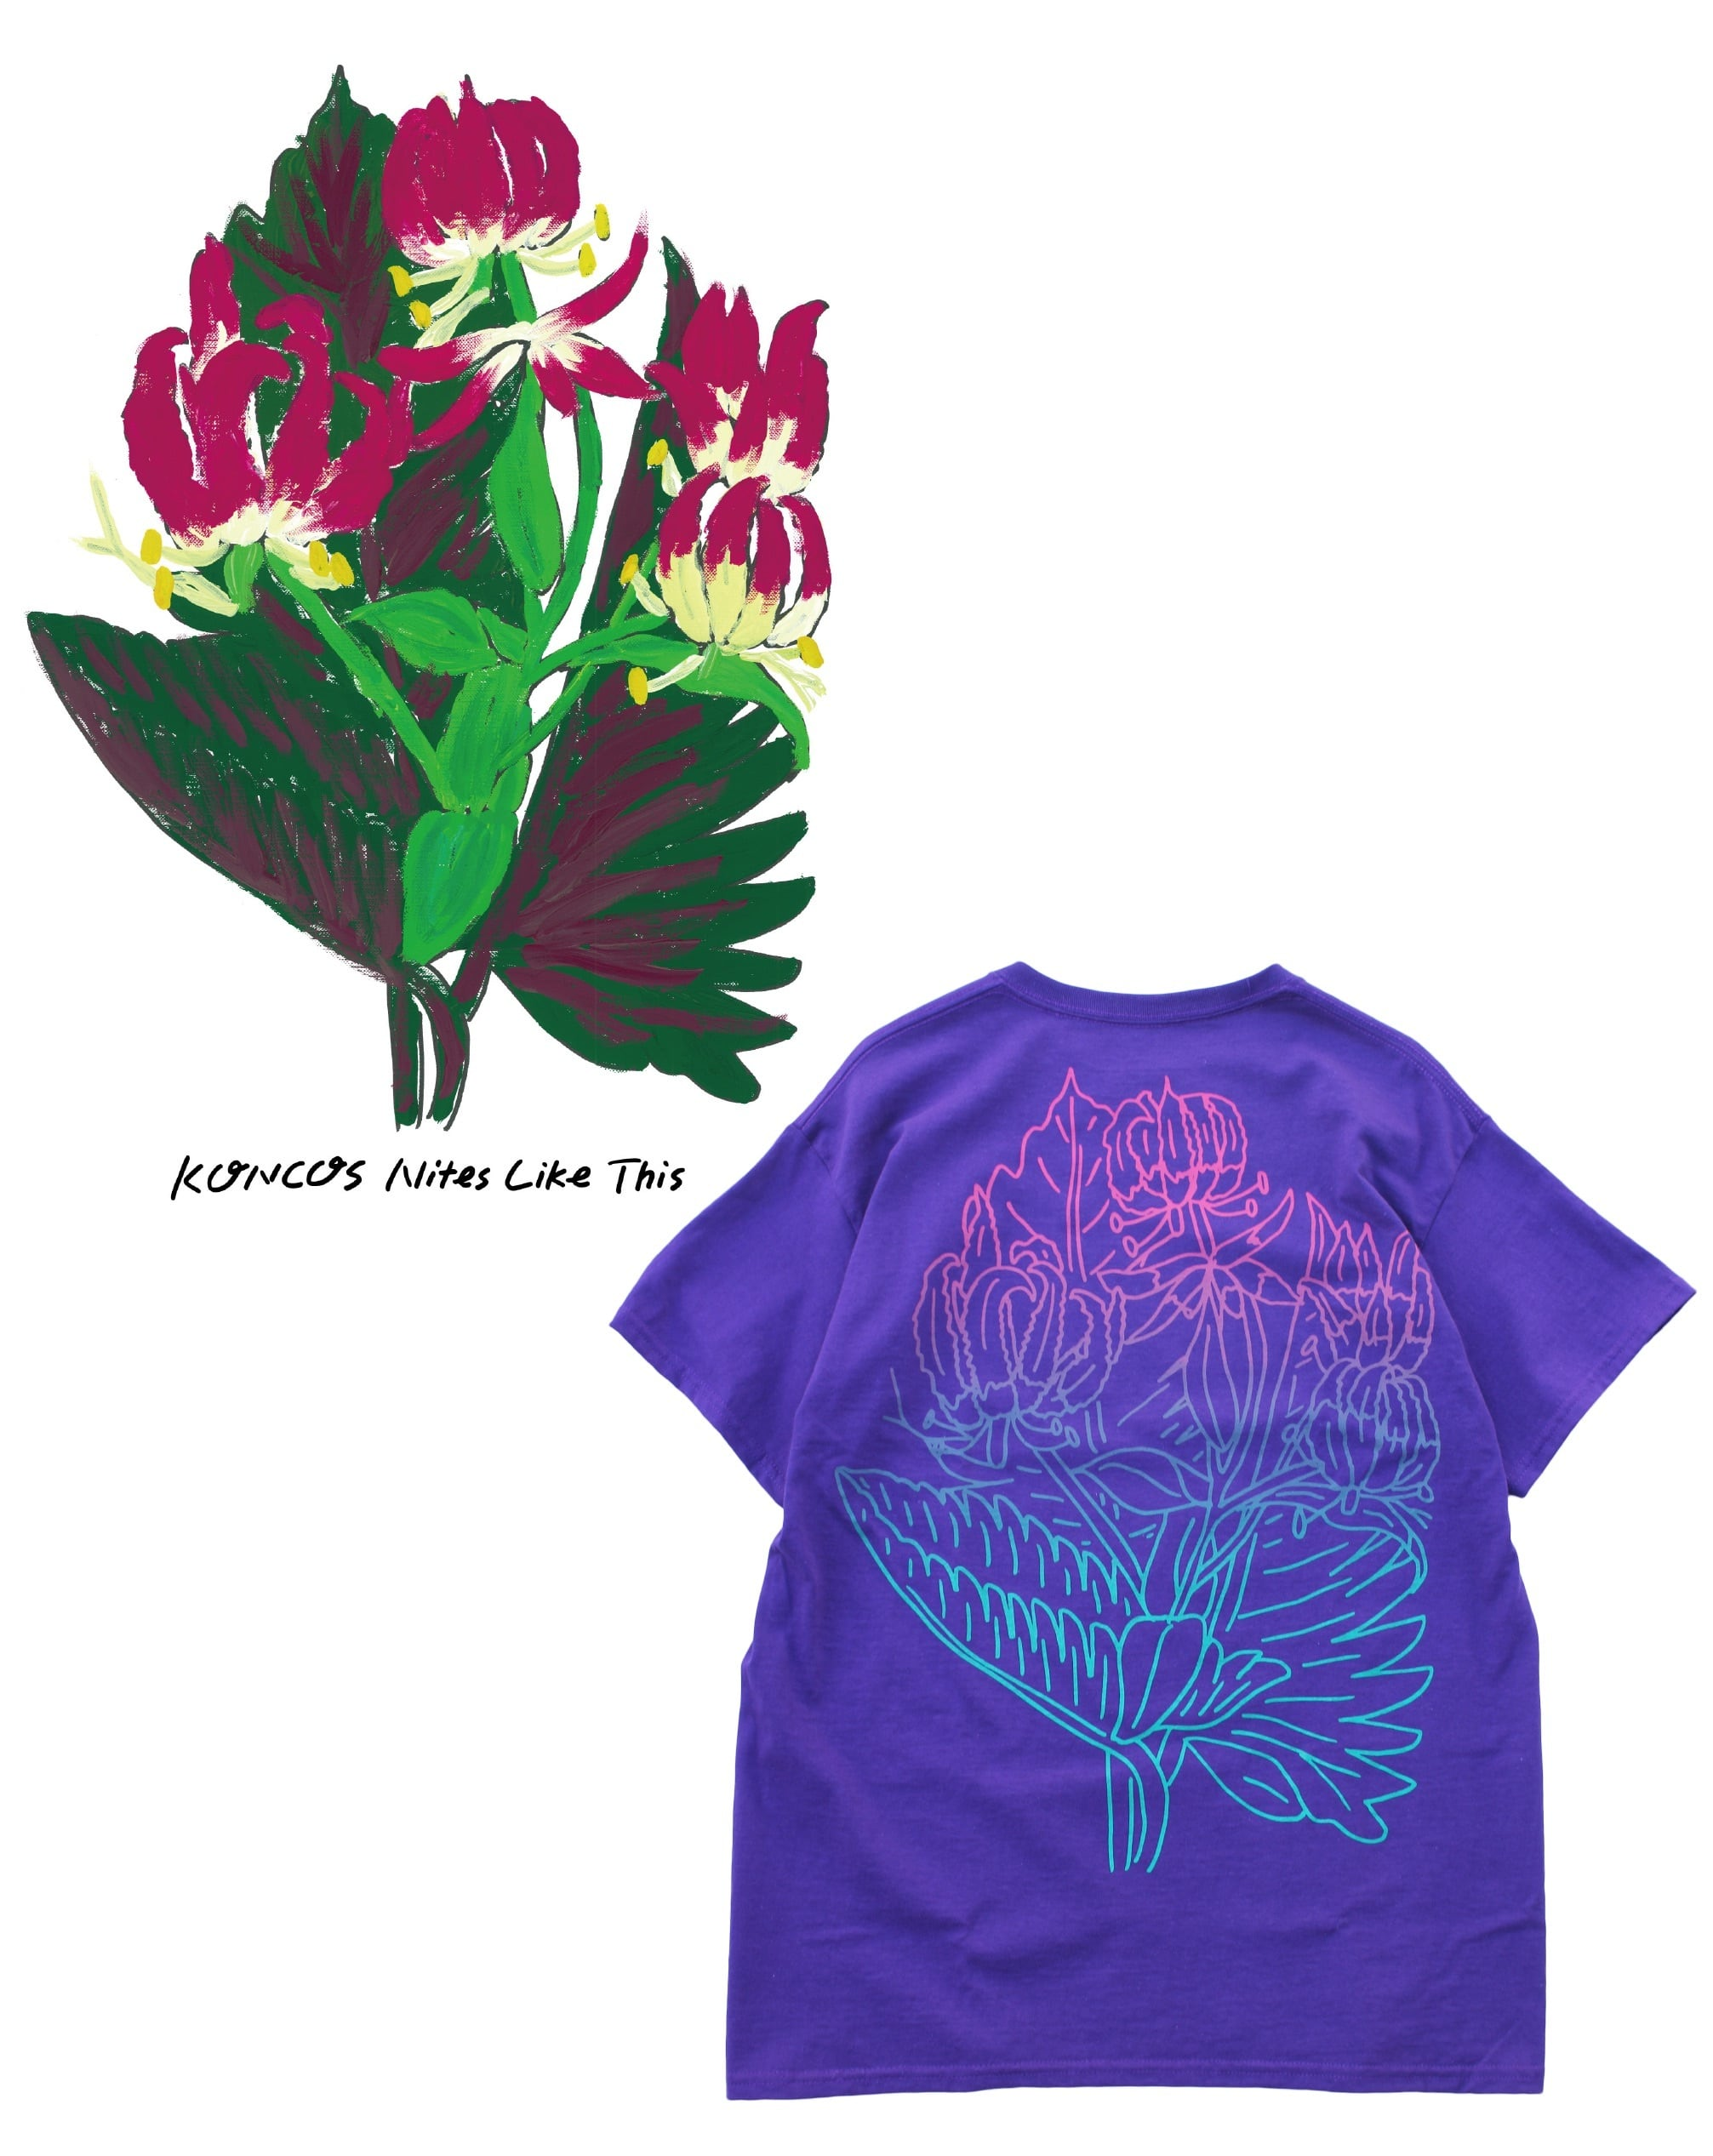 Anoraks + Forager Nites Like This T-Shirt